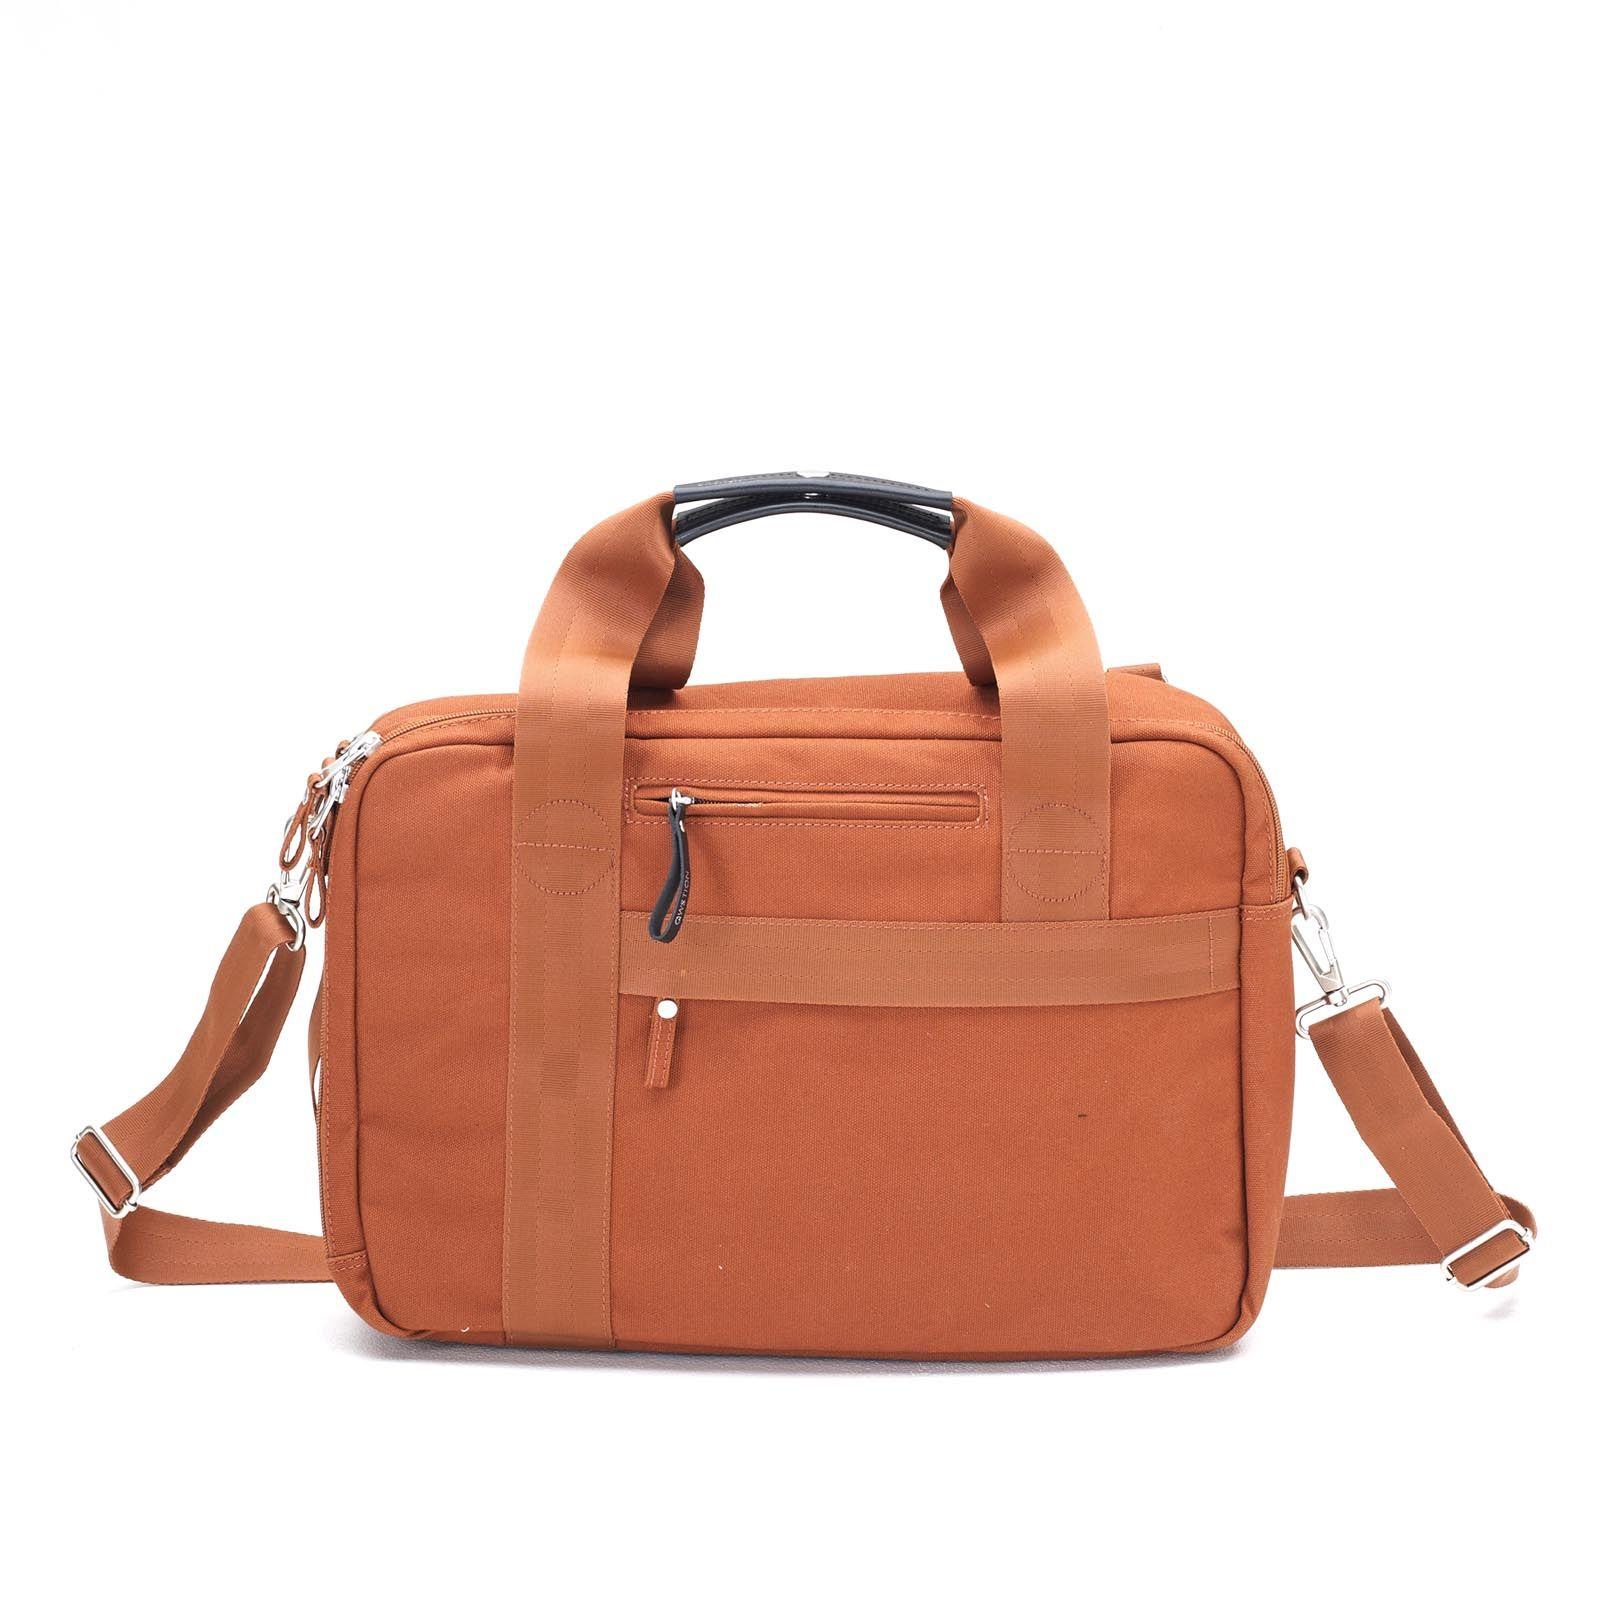 Office Bag - Organic Rust